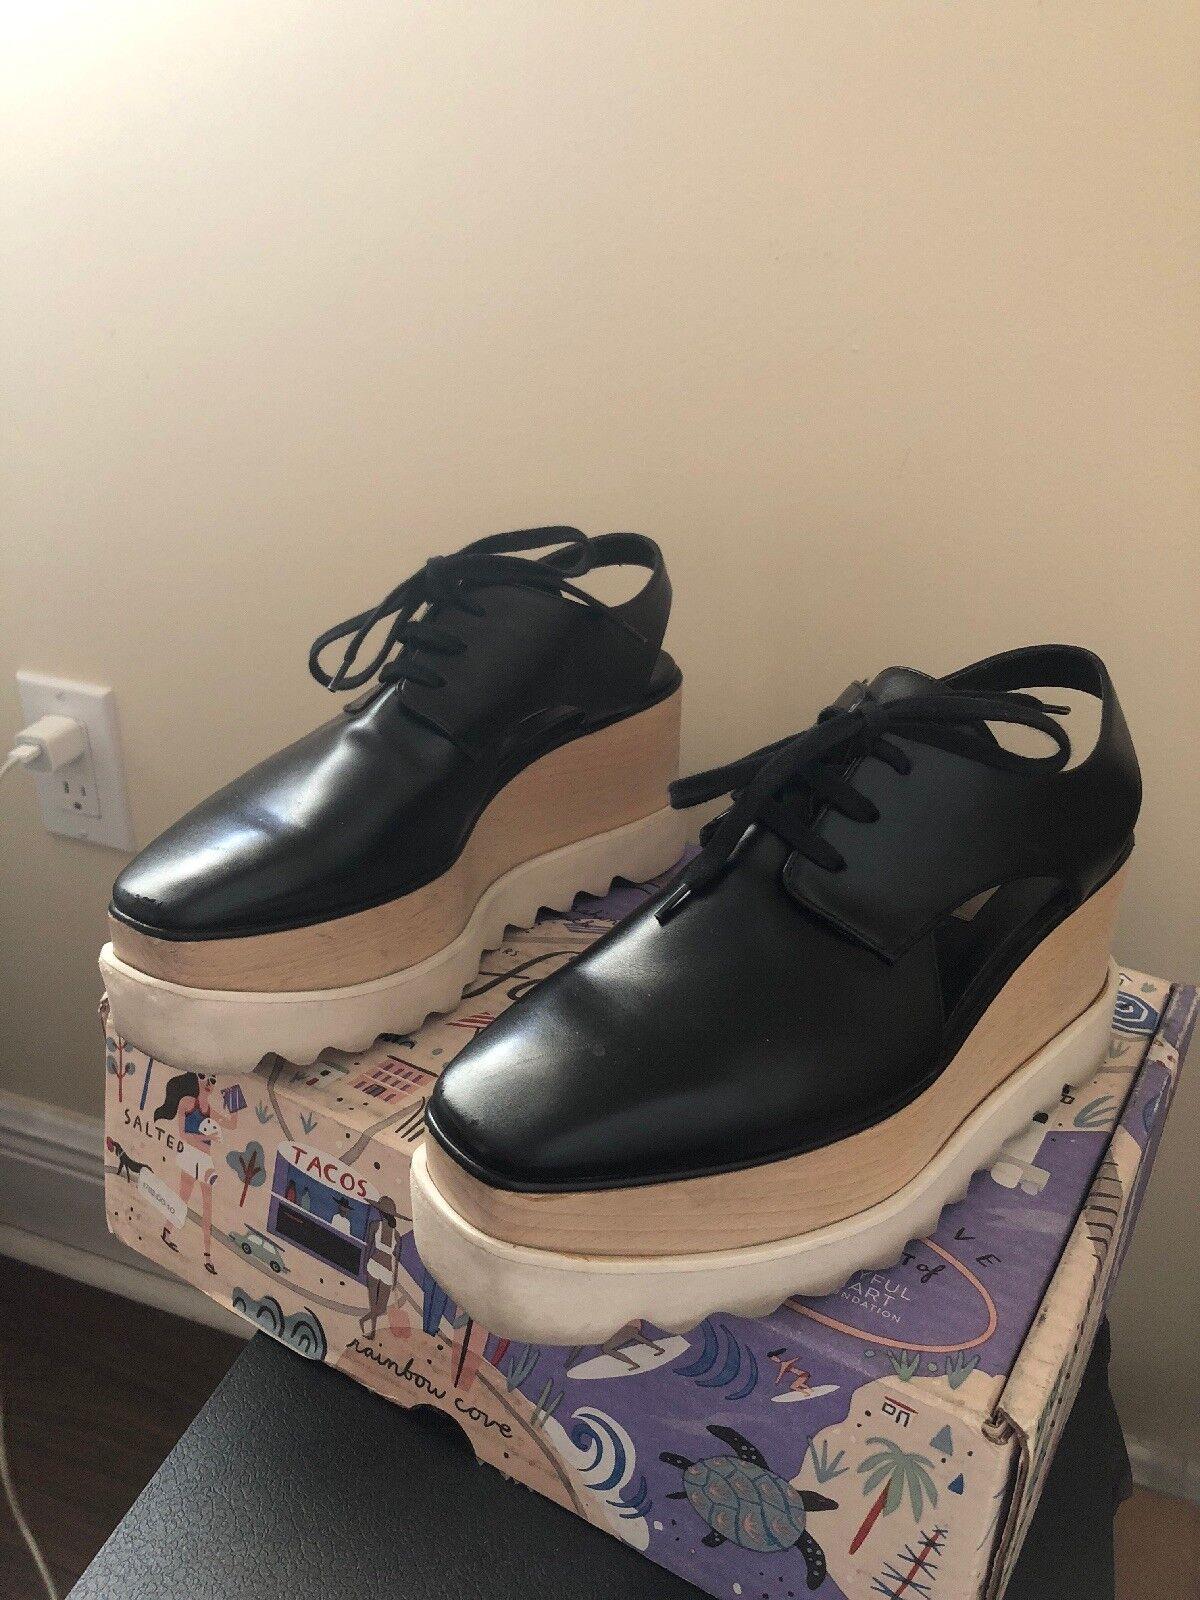 100% Authentic STELLA MCCARTNEY  Black Elyse Platform Ankle shoes